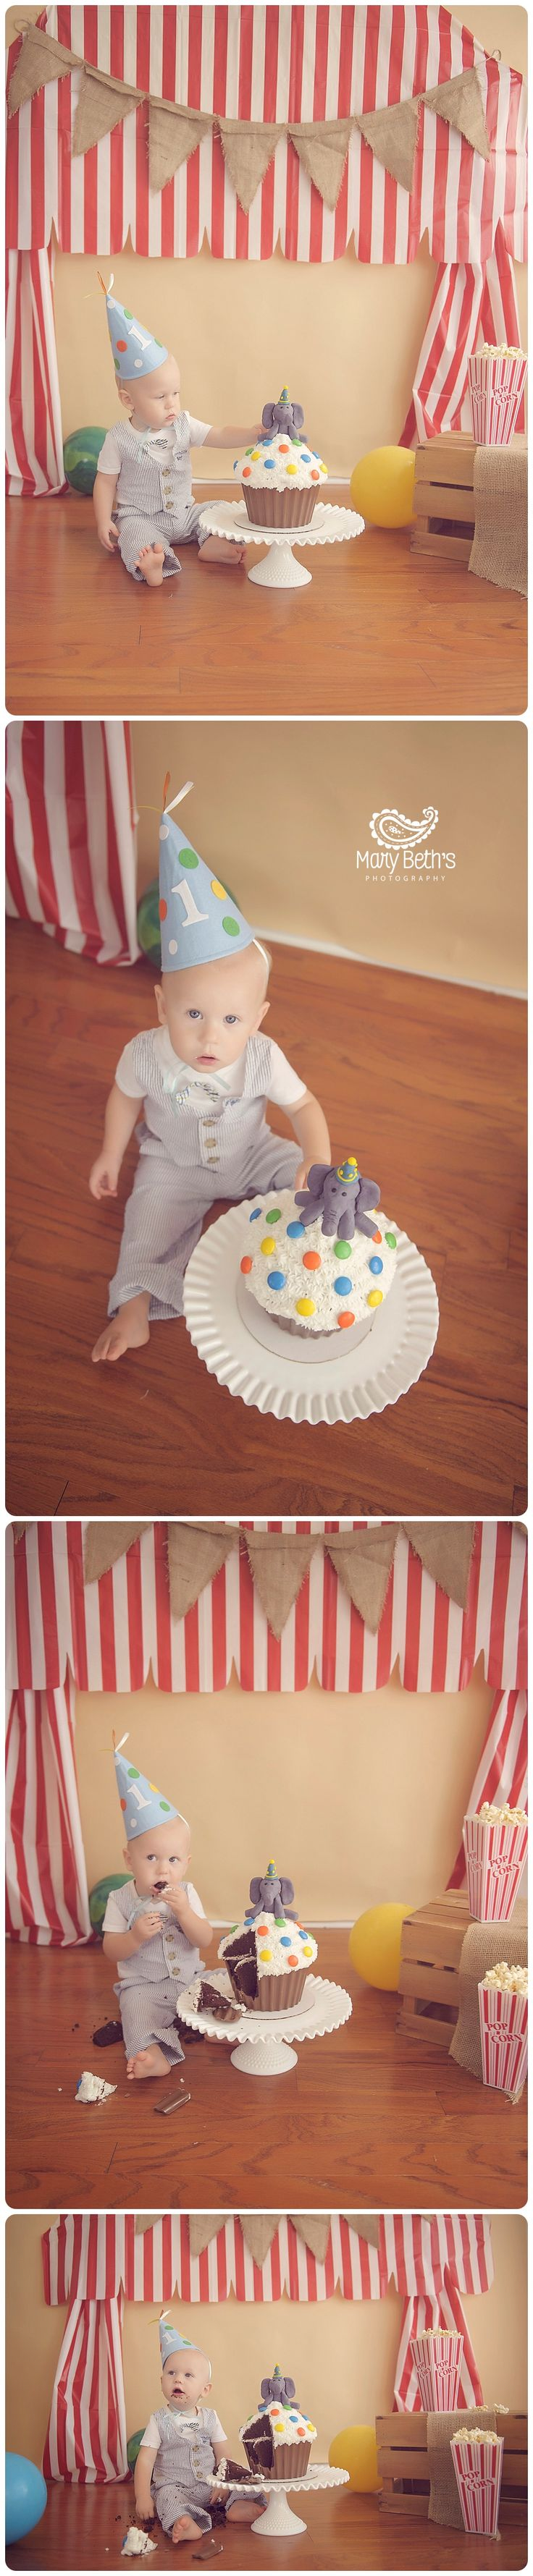 Circus Themed Cake Smash for Mary Beth's Photography | Augusta GA Newborn Photographer, Augusta GA Family Photography